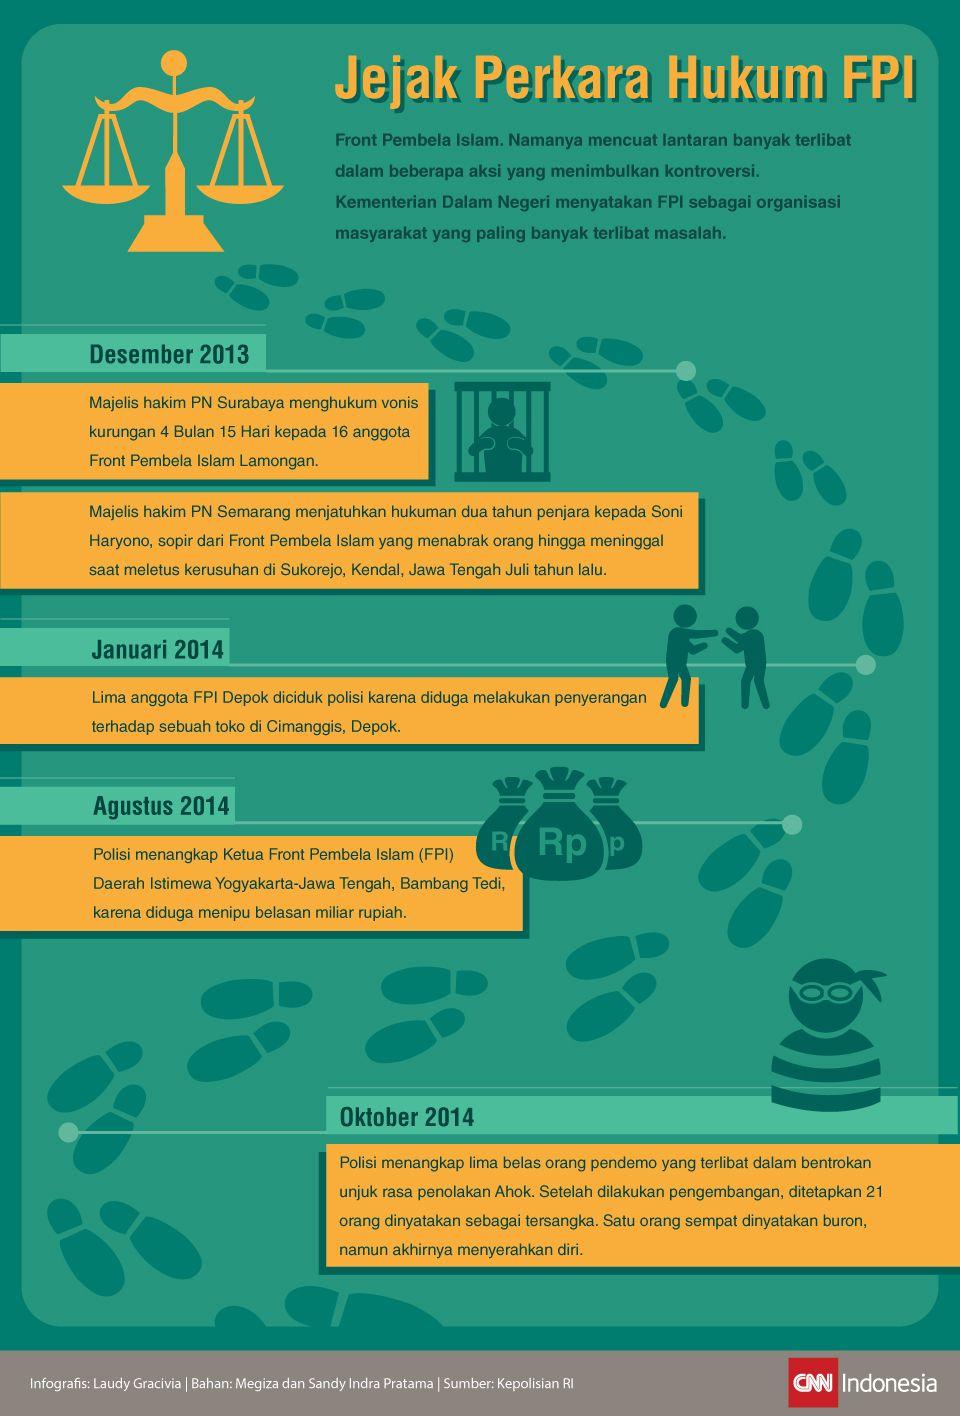 Infografis mengenai jejak hukum yang dibuat oleh FPI